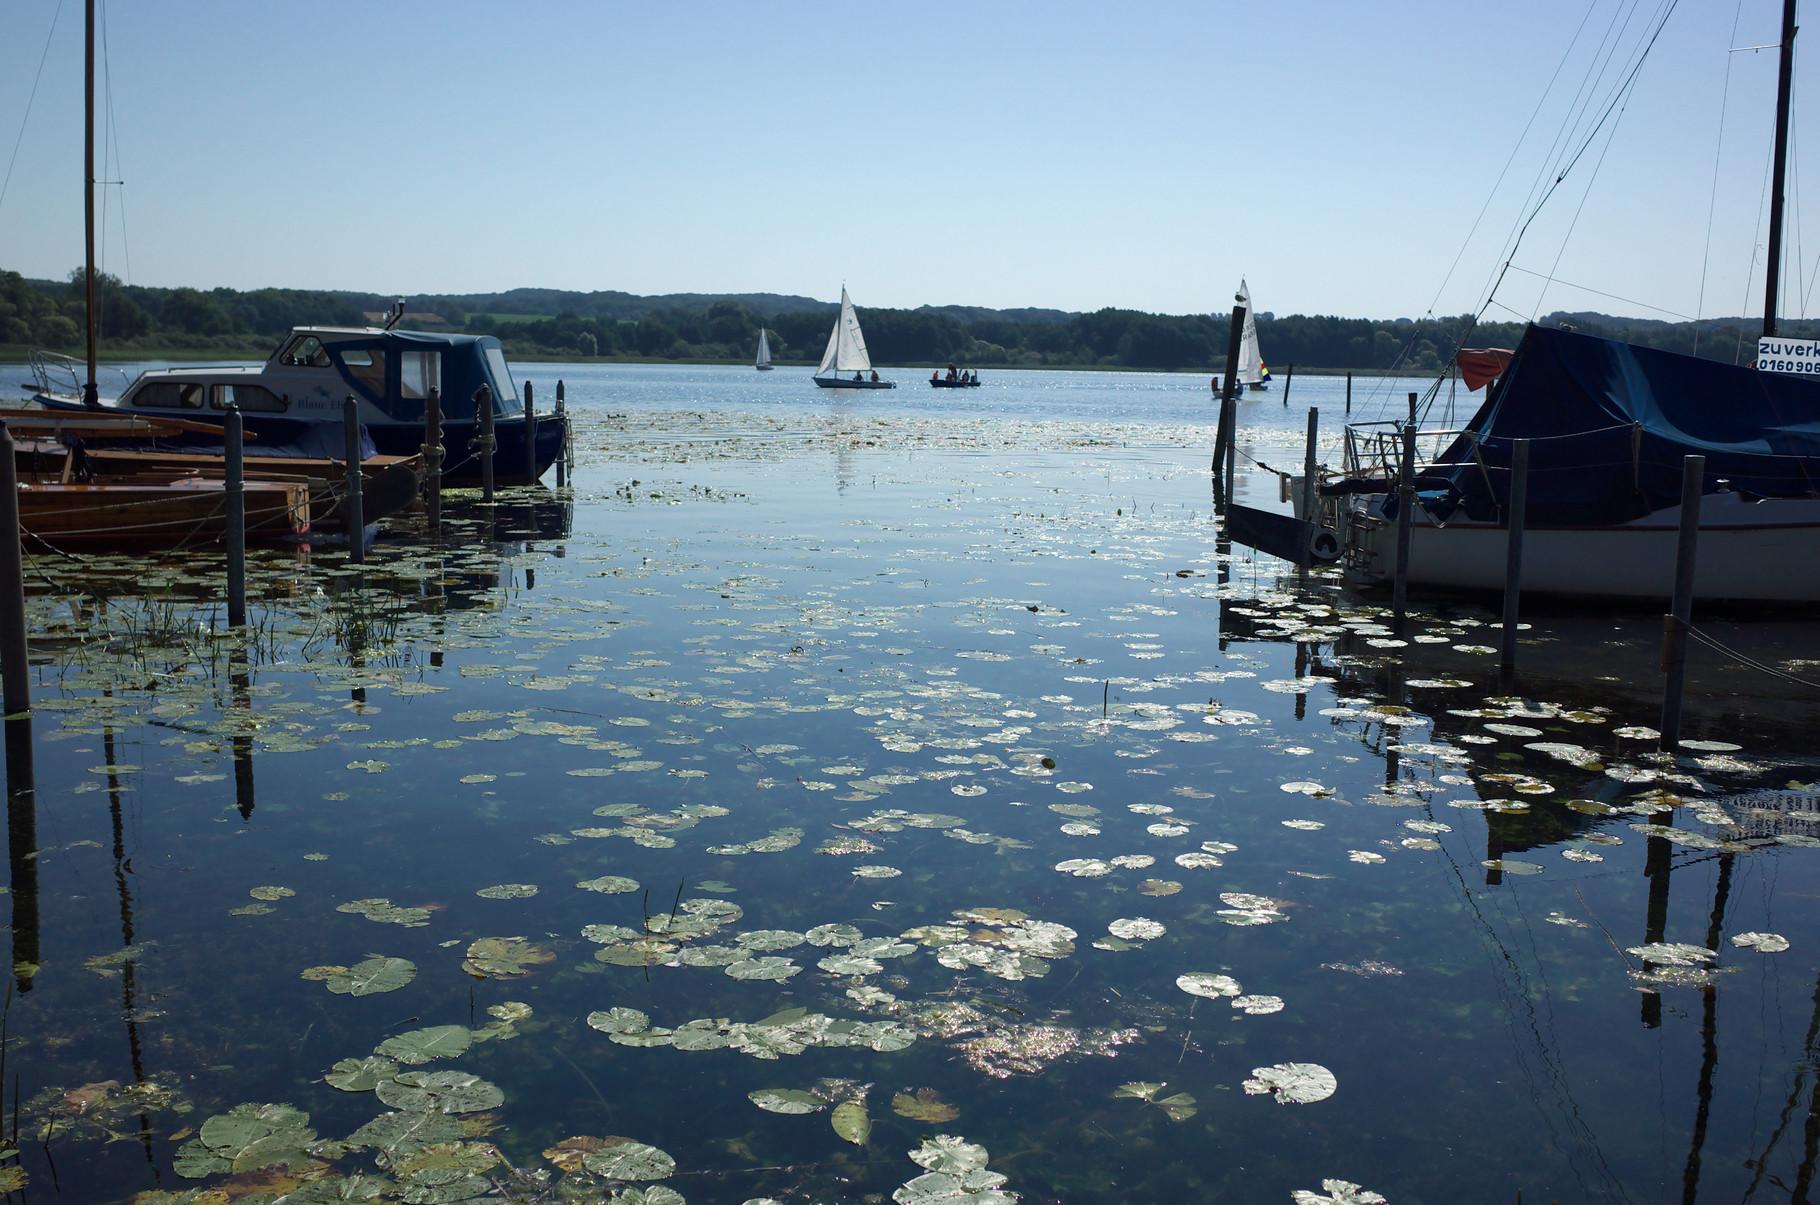 Westufer des Ratzeburger Sees bei Groß Sarau am 22.08.2015